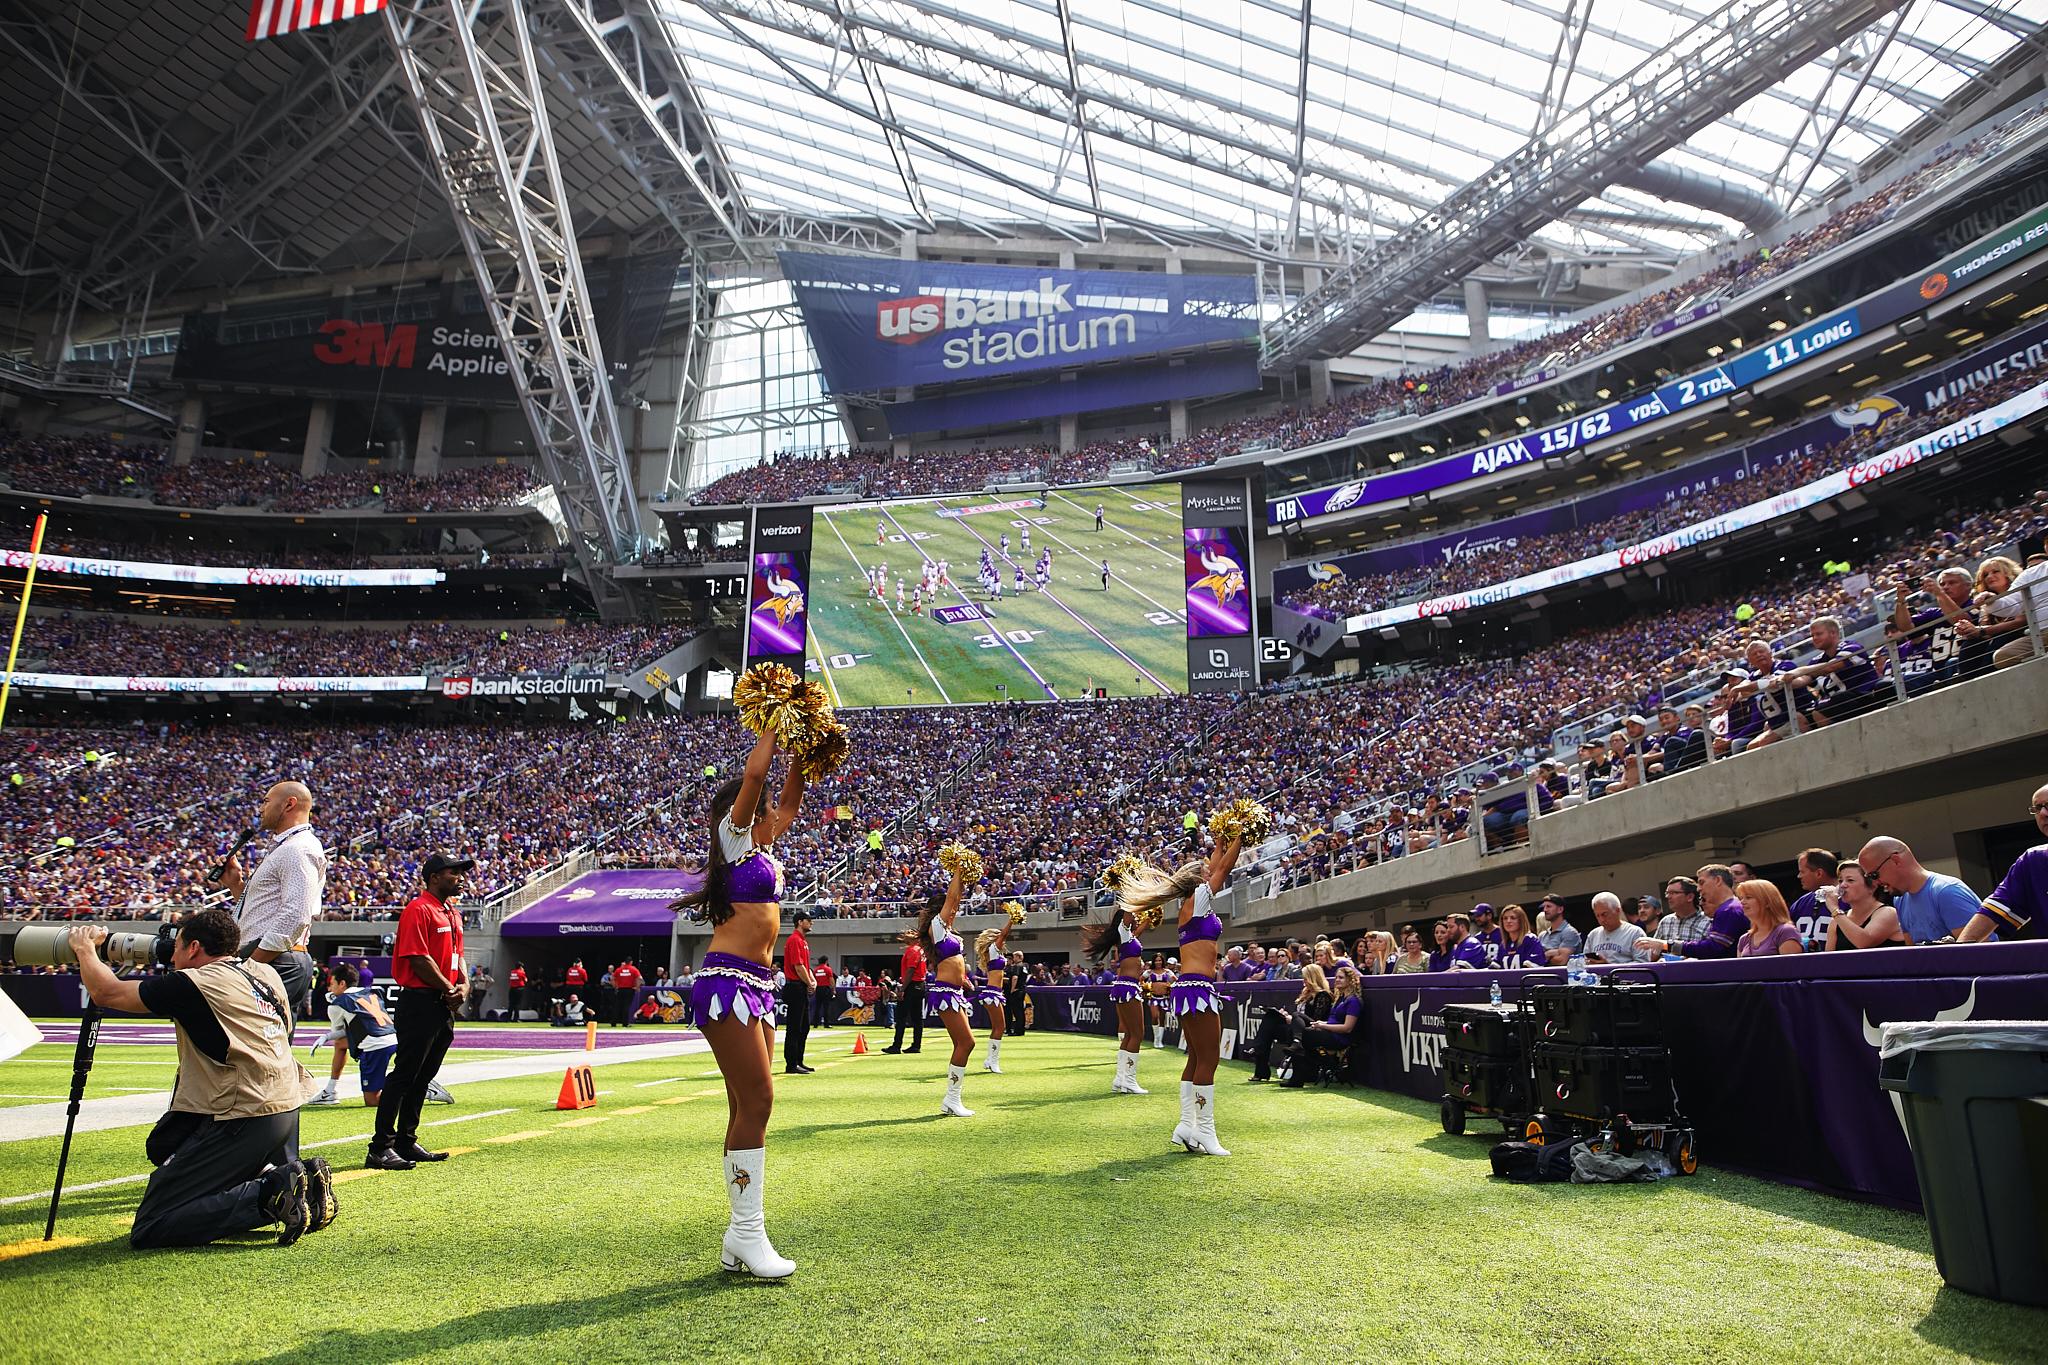 Minnesota_Vikings_Game_US_Bank_Stadium_Minneapolis_Minnesota_Photography_By_Joe_Lemke_054.JPG